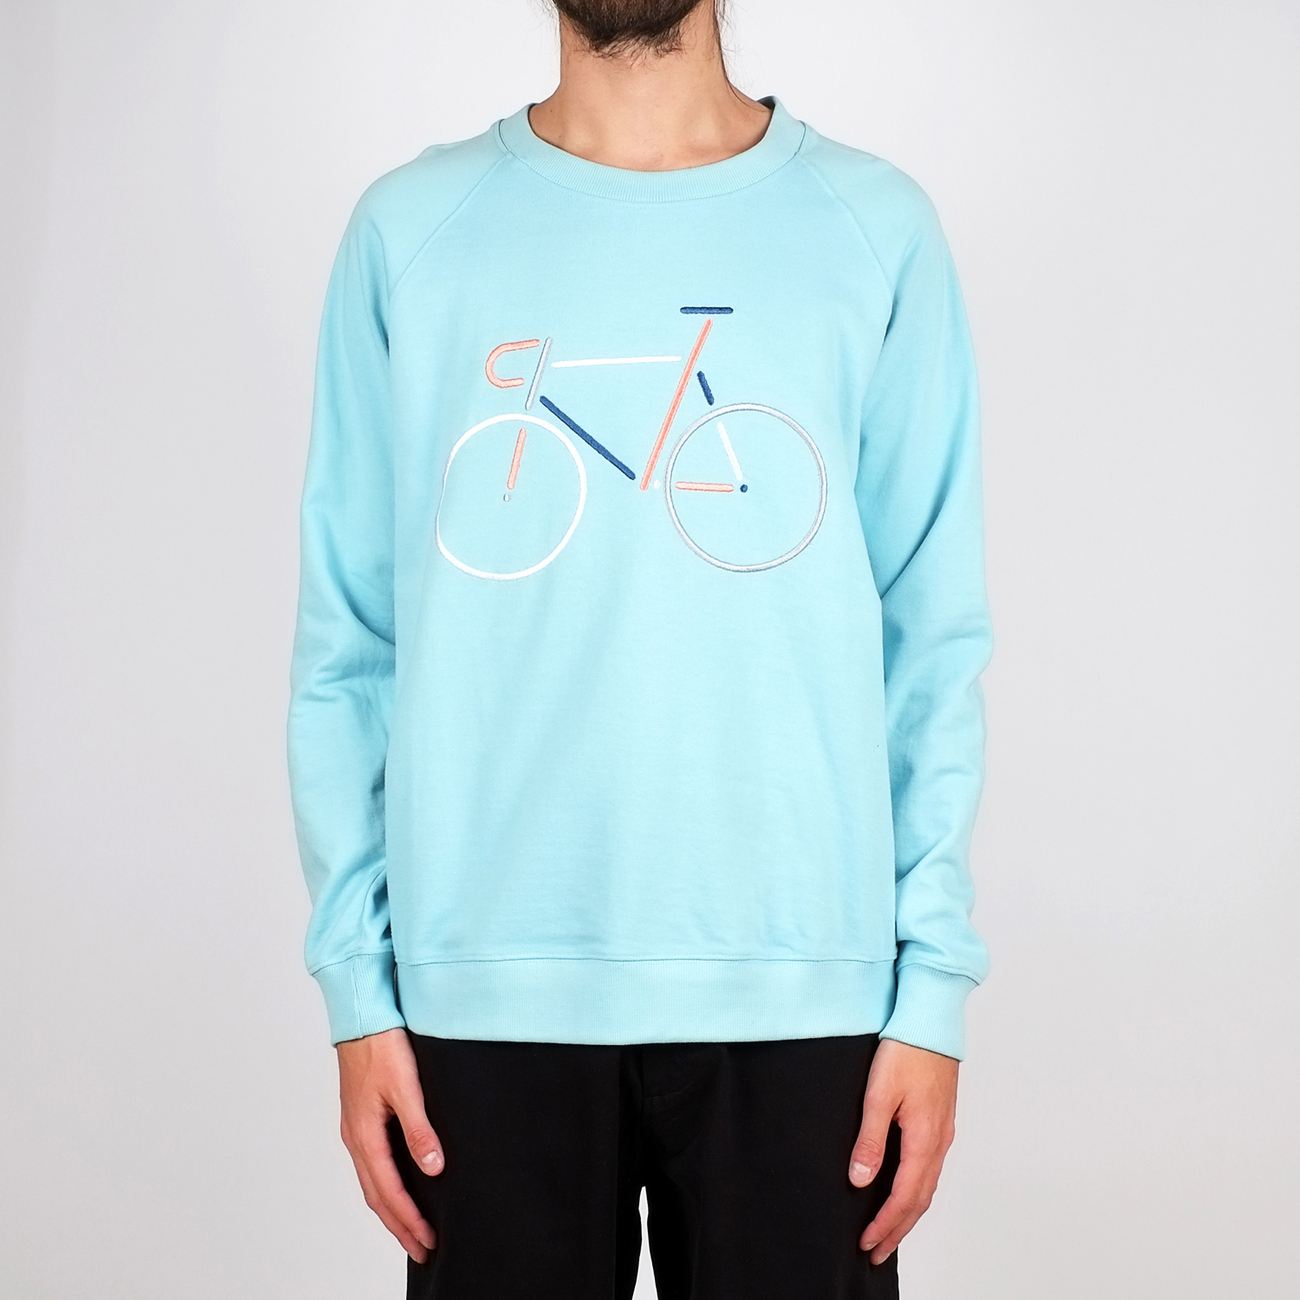 Sweatshirt Malmoe Color Bike Embroidery Beach Blue